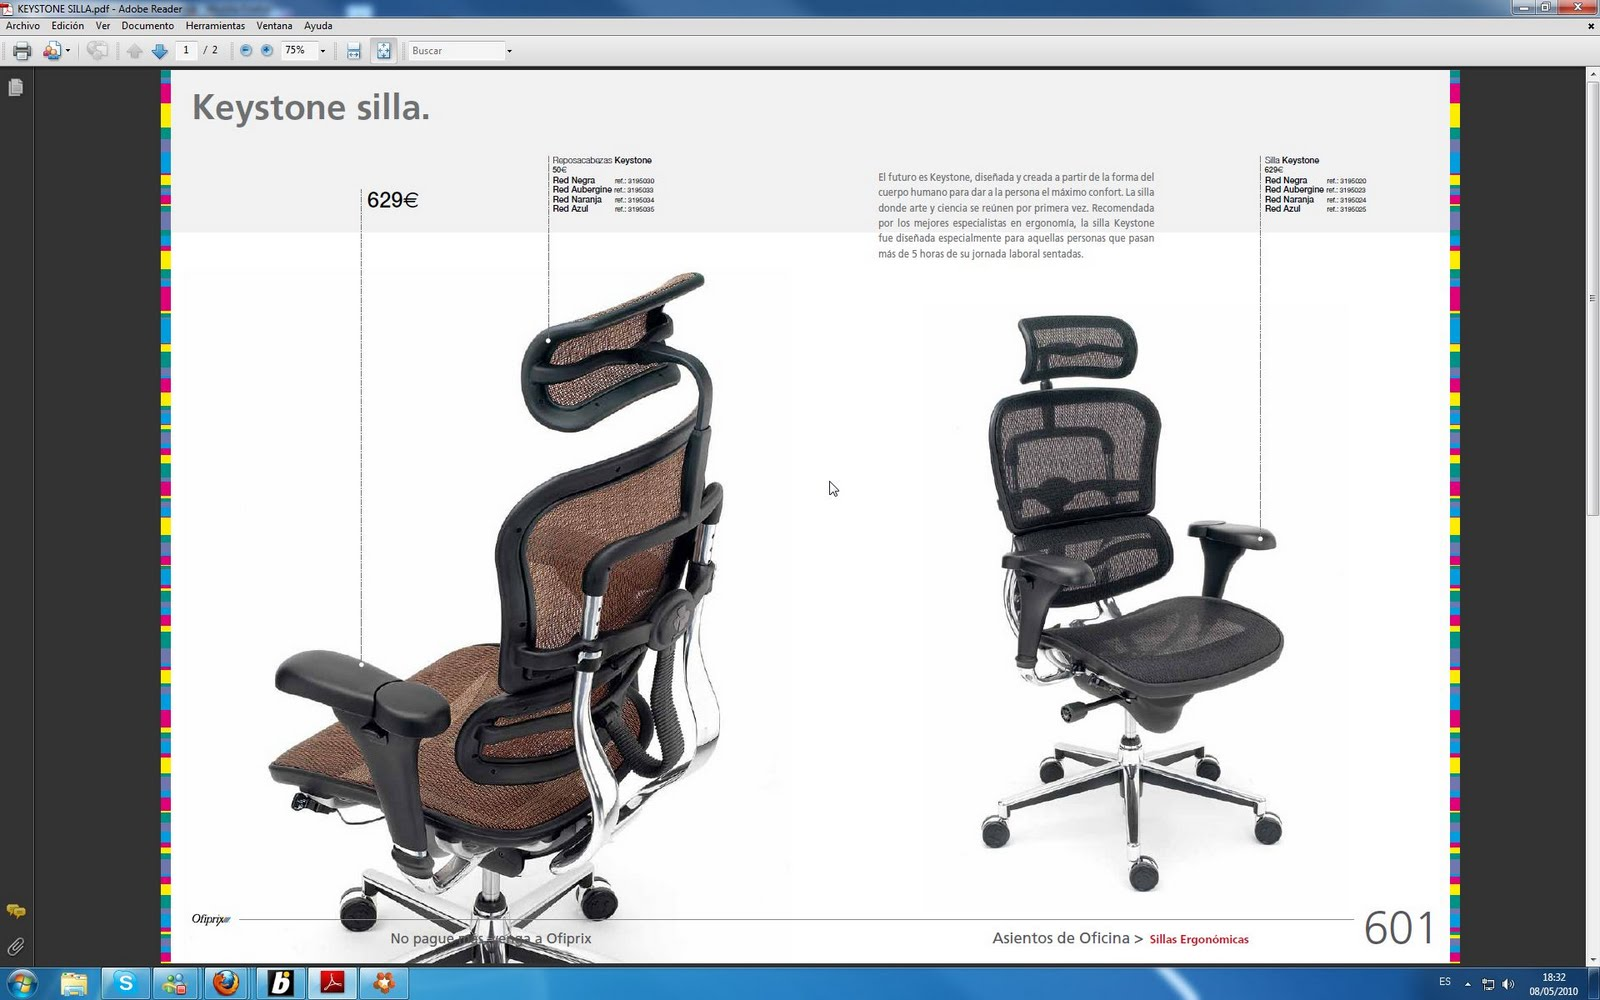 Dudo entre 3 sillas ayuda charla general educapoker - Sillas para estudiar ...